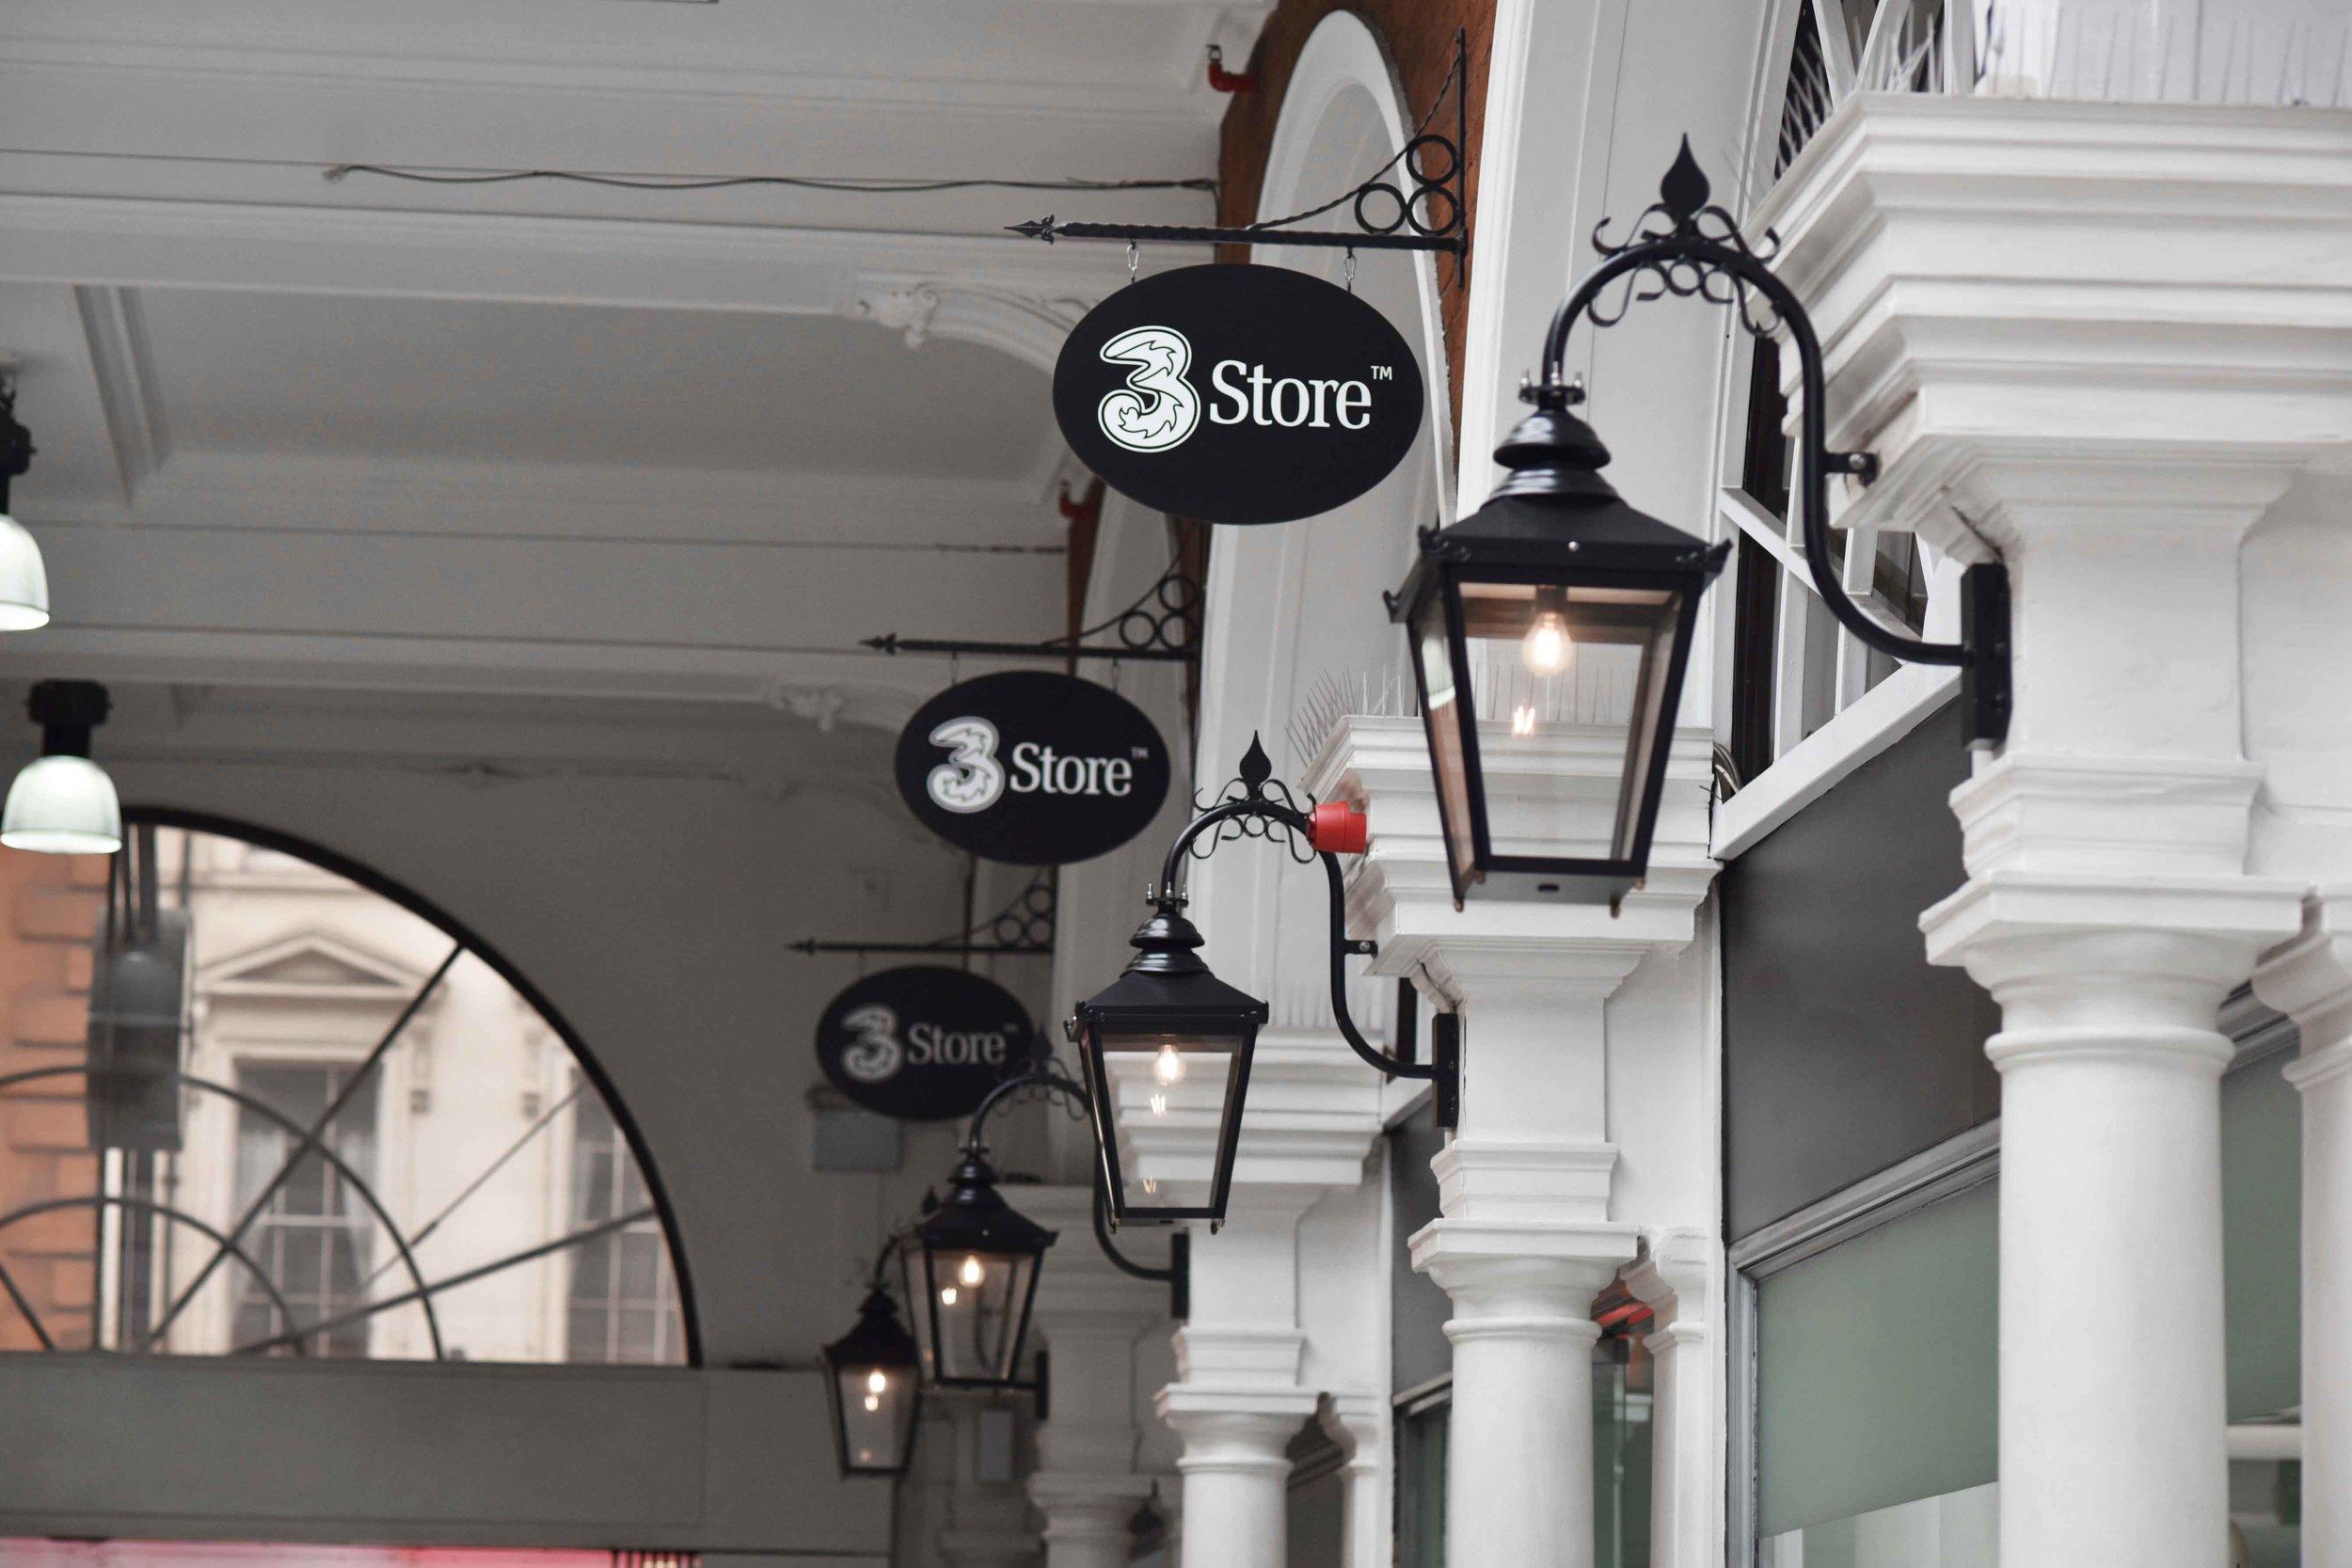 High Street Kensington tube station exit, London. Image©sourcingstyle.com